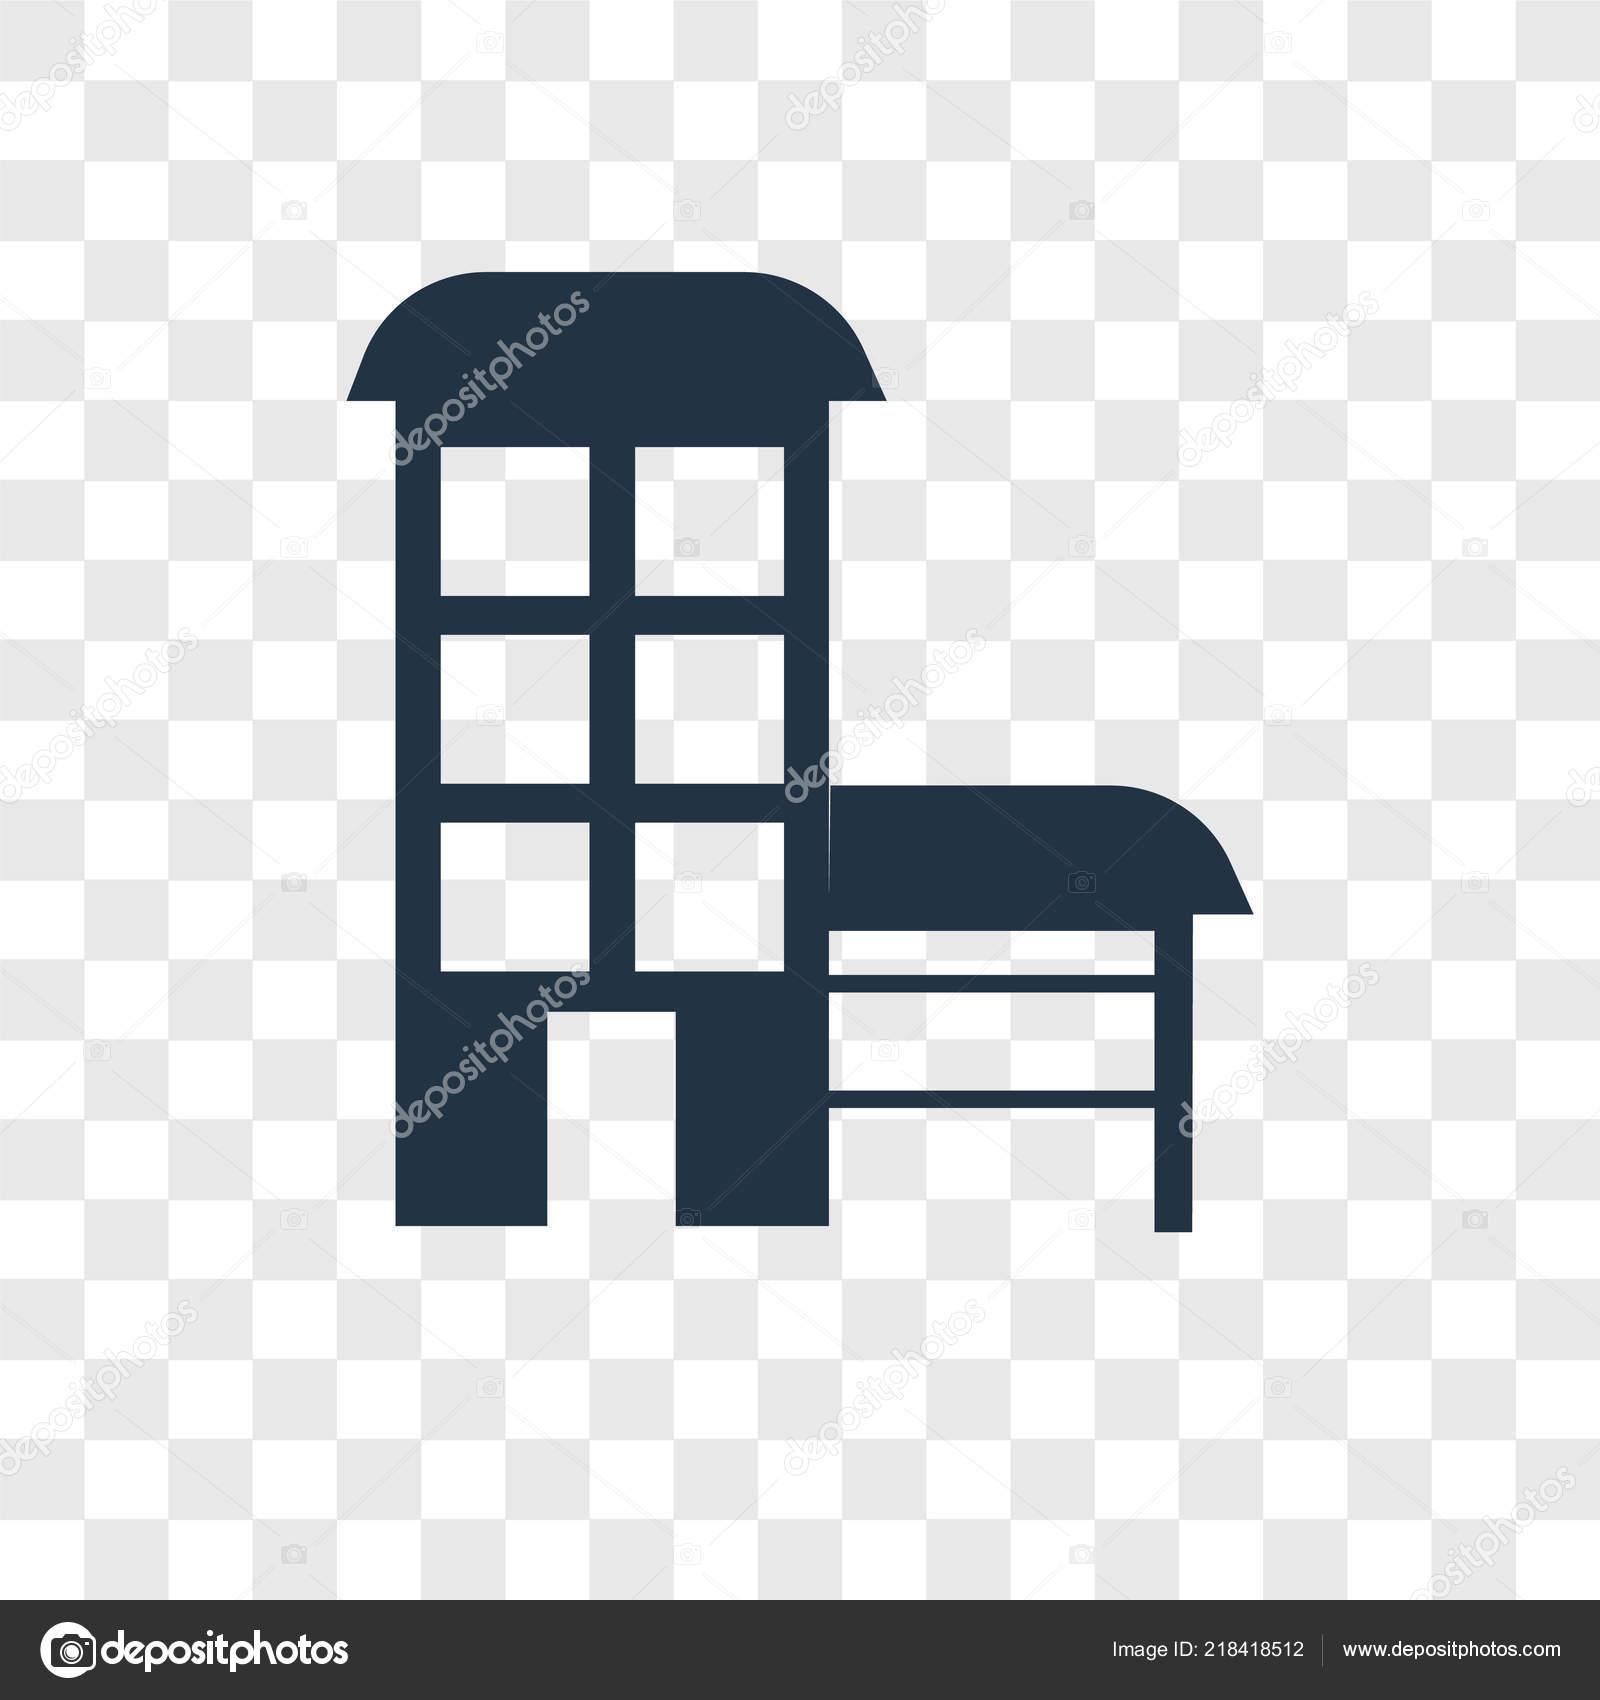 House Icon Trendy Design Style House Icon Isolated ... on chairs icon, bar shelf icon, furniture icon, fireplace icon, books icon, snowflake icon, bar soap icon, leather icon, table icon, console icon,